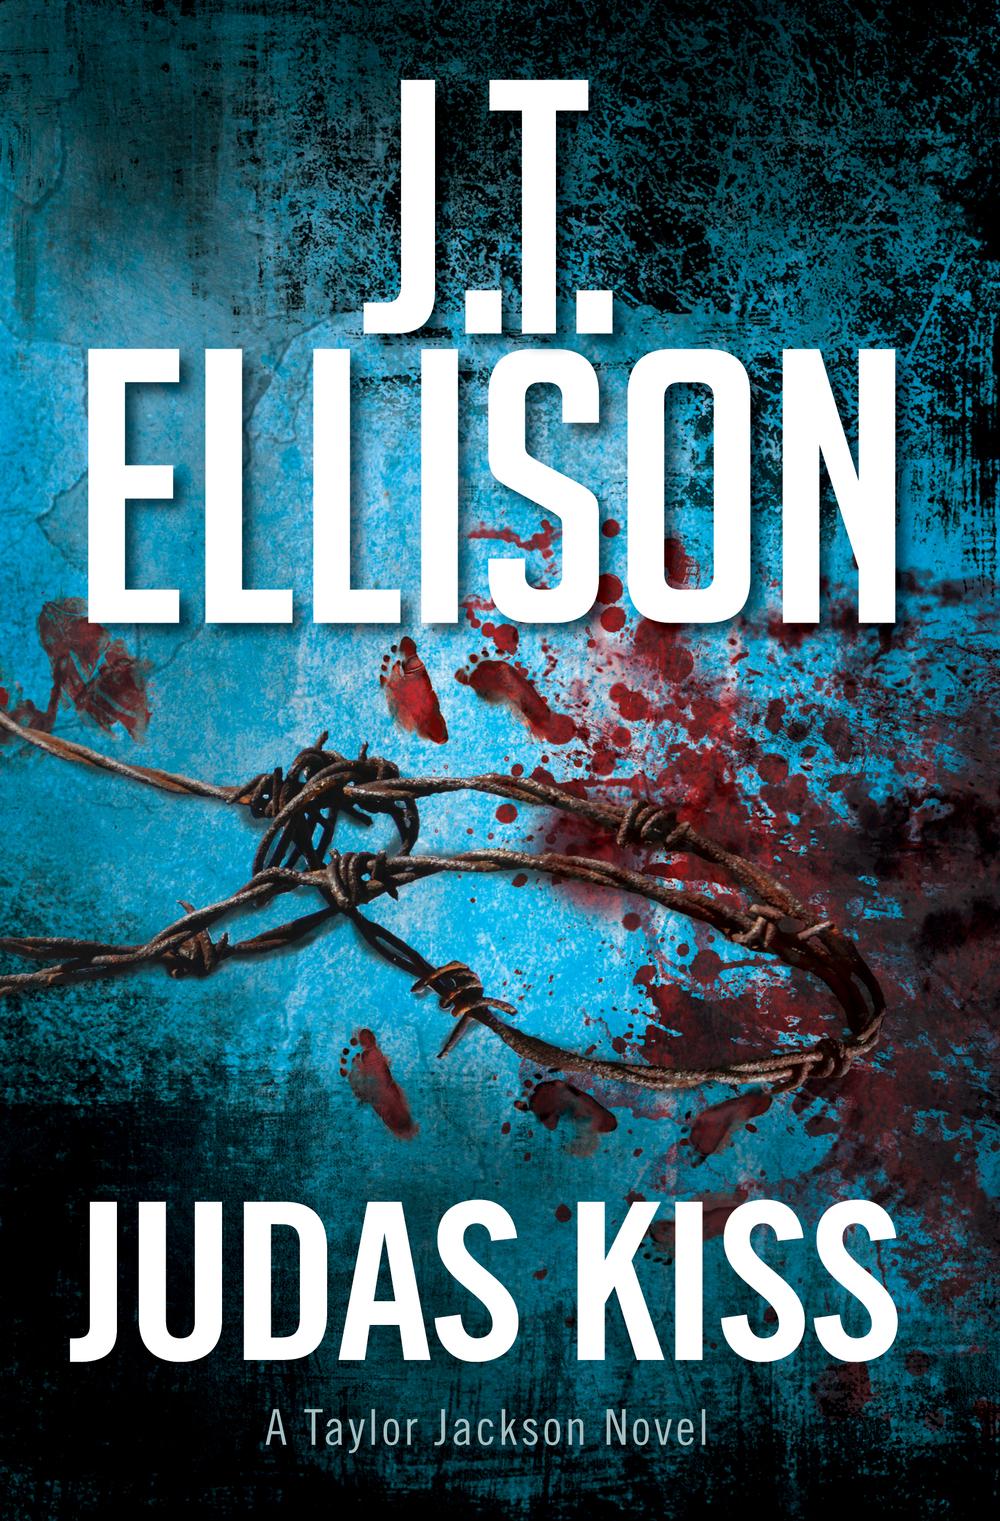 Australia Judas Kiss.jpg